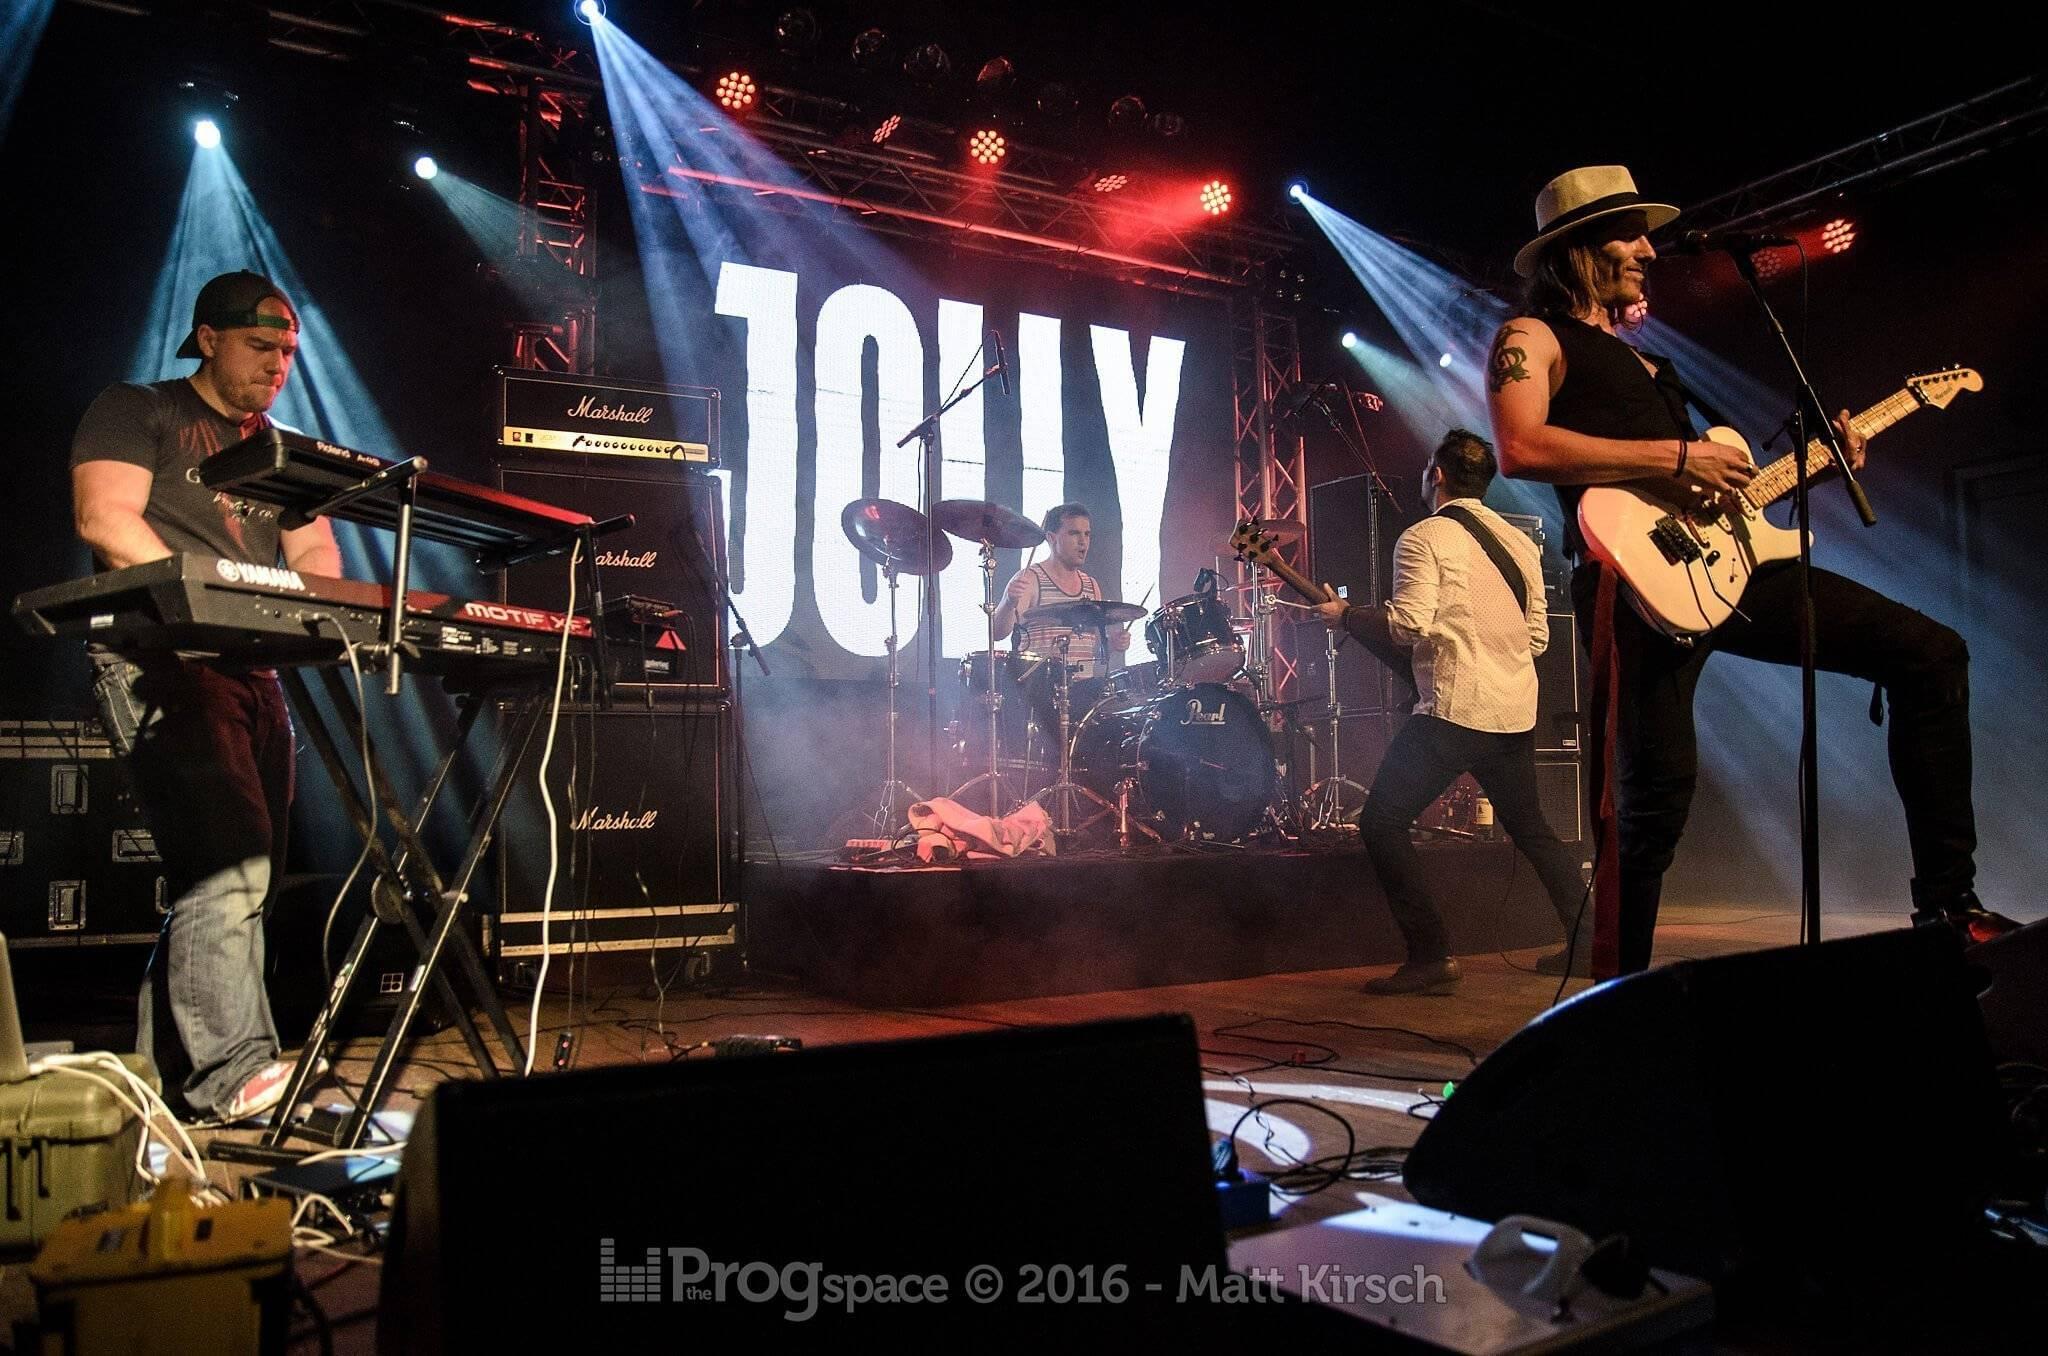 03-jolly-17